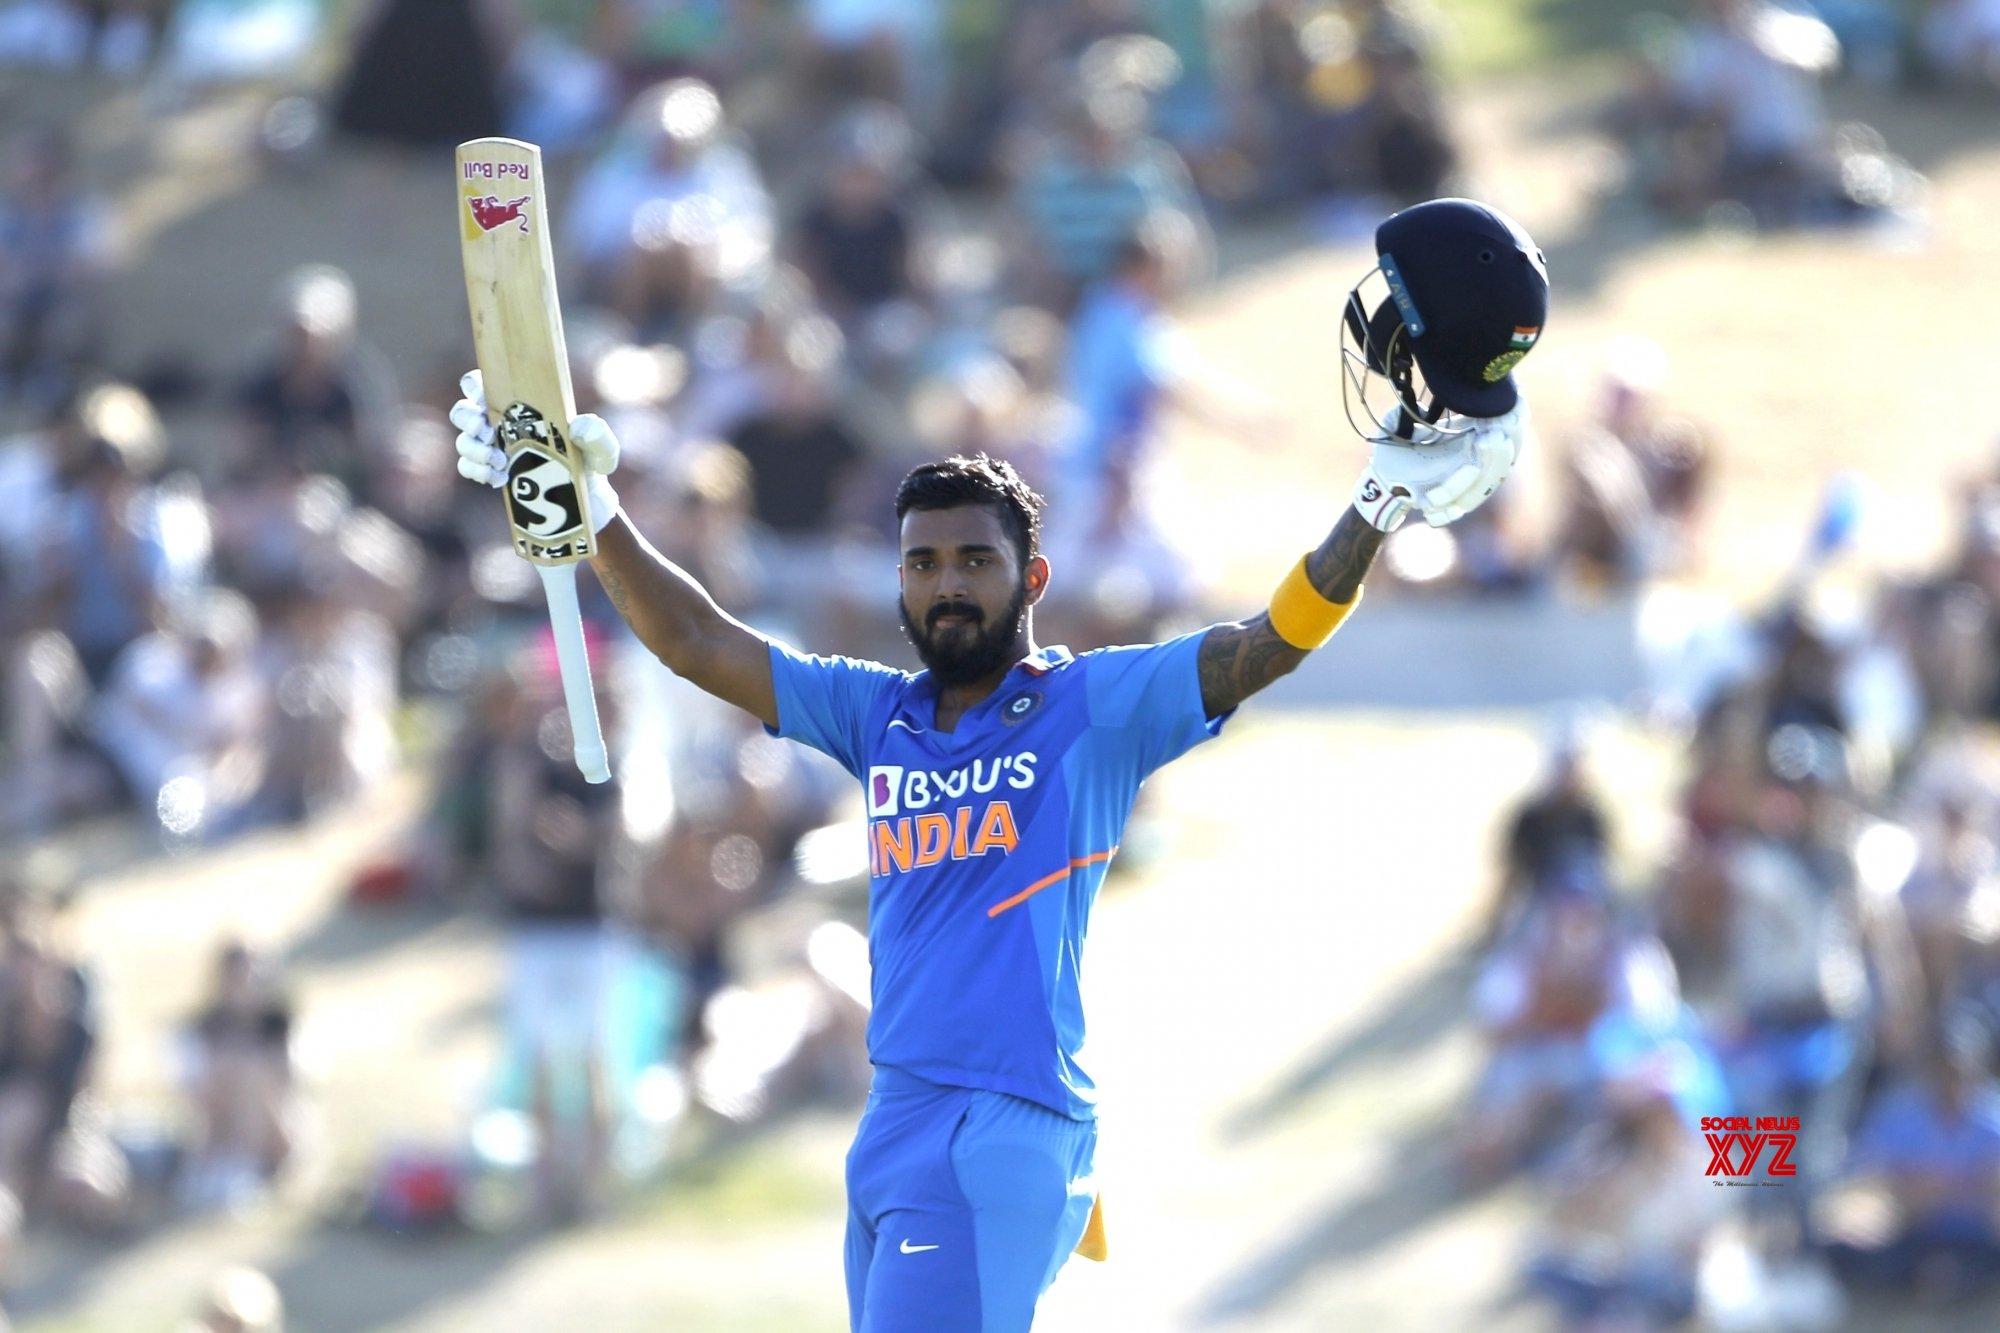 Mount Maunganui: 3rd ODI - India Vs New Zealand (Batch - 6) #Gallery